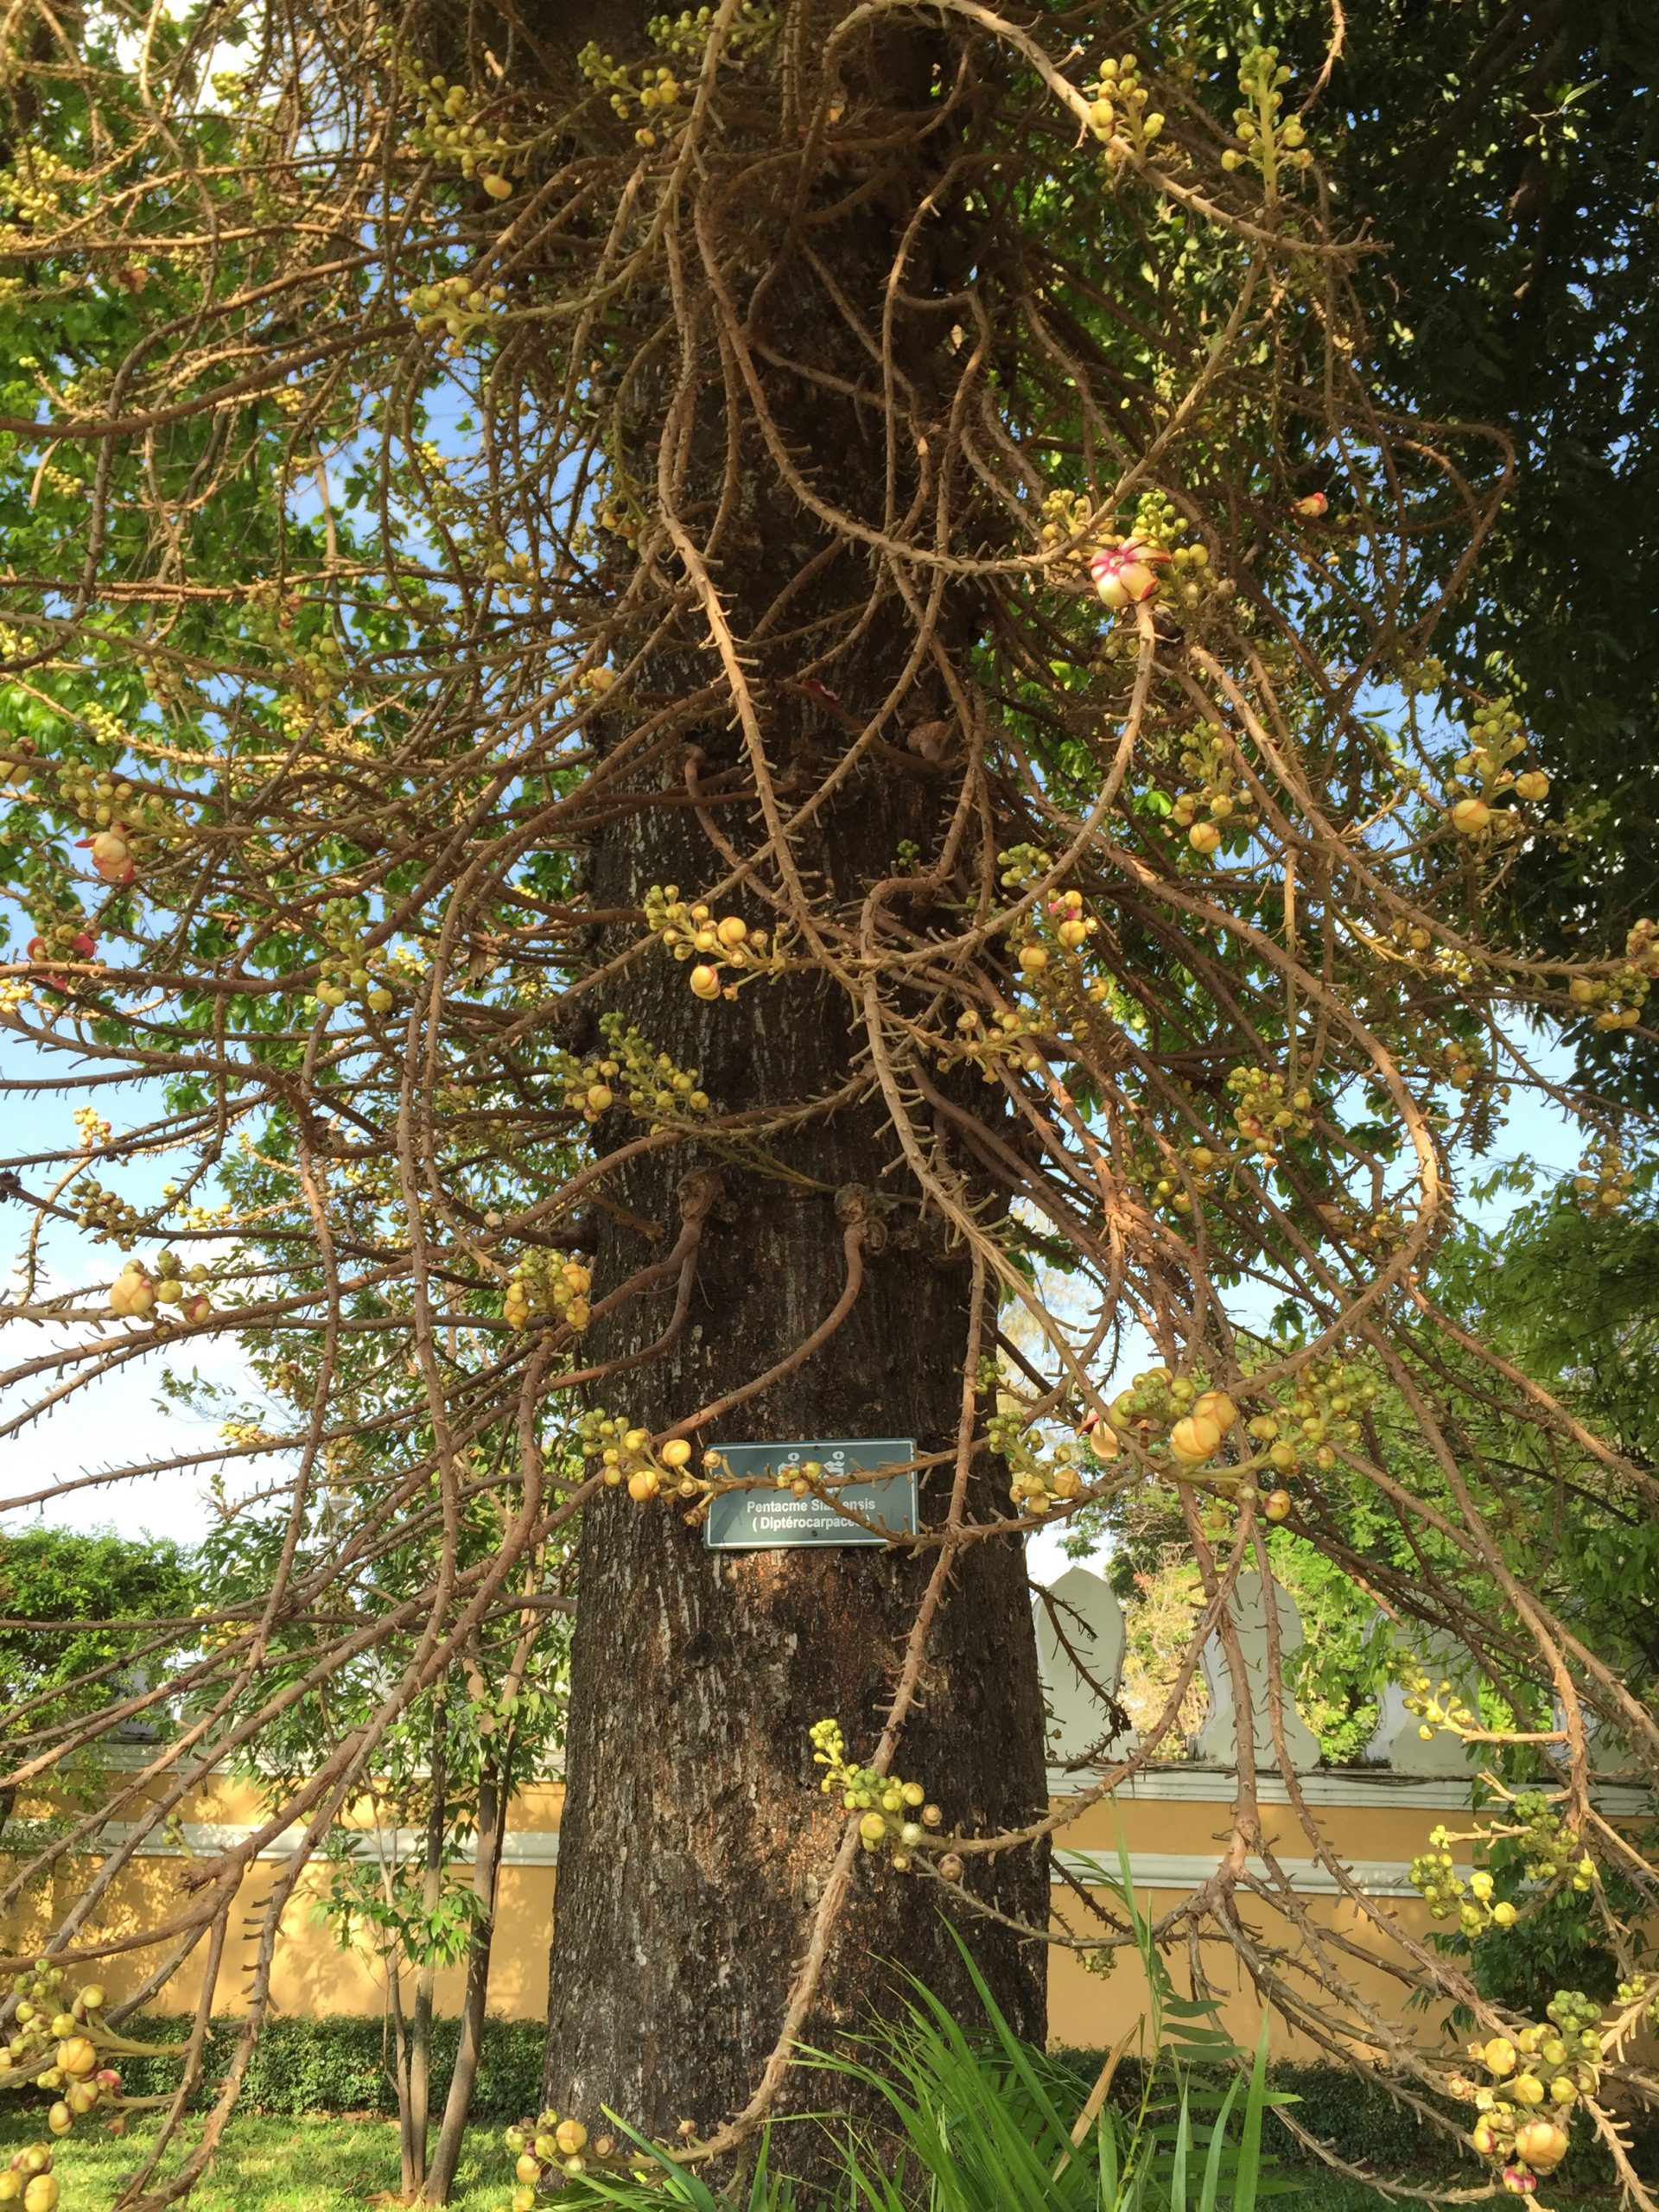 The Sal tree in Royal Palace, Phnom Penh